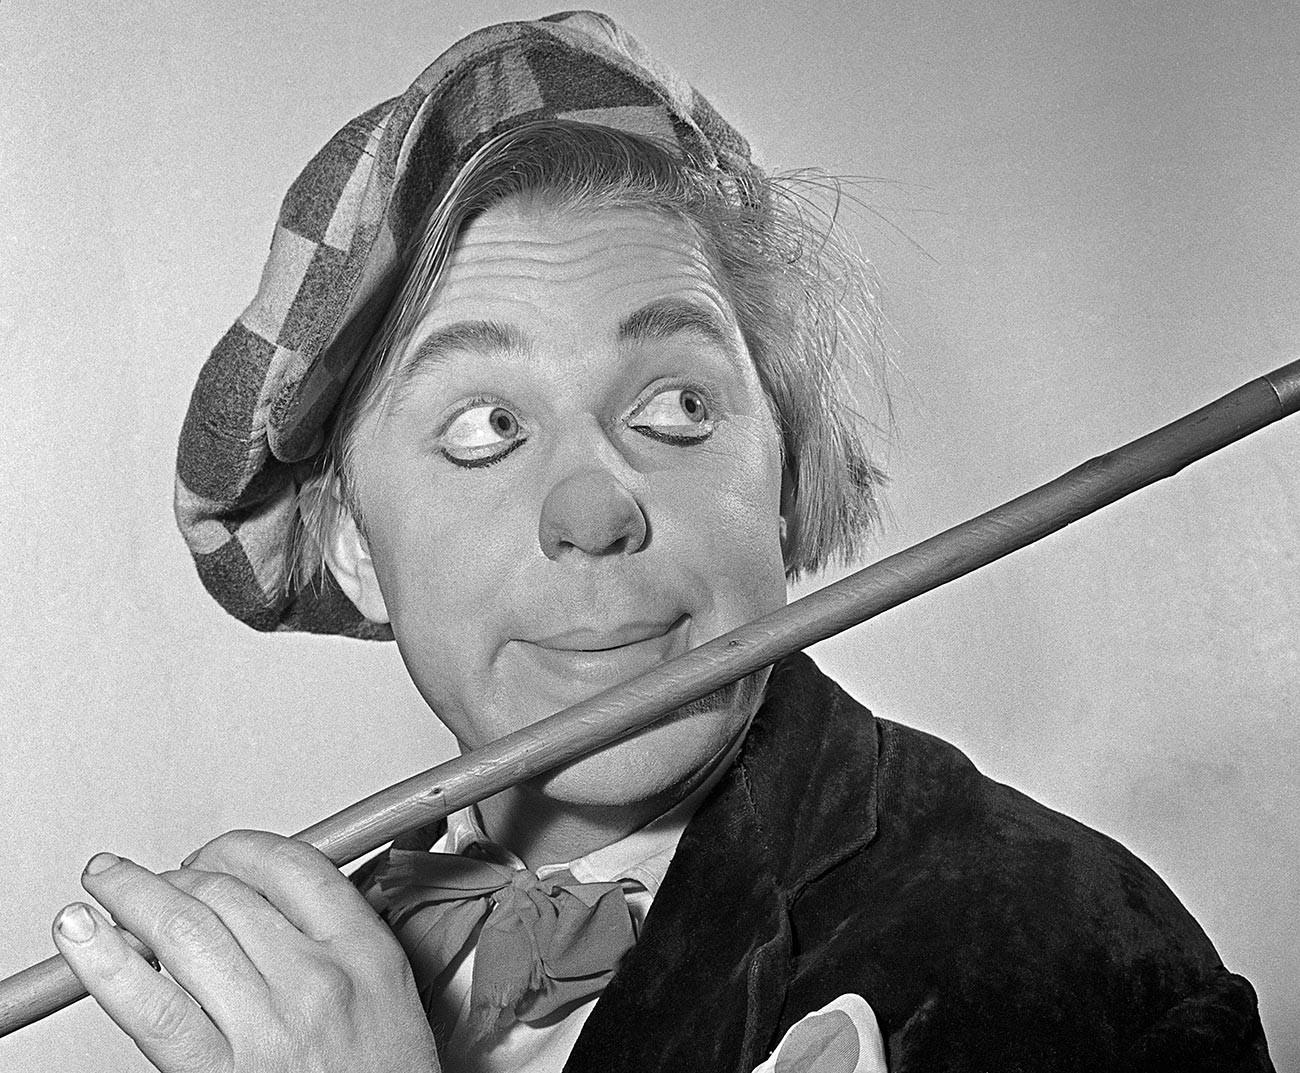 Oleg Popov was nicknamed the 'Sunny Clown'.